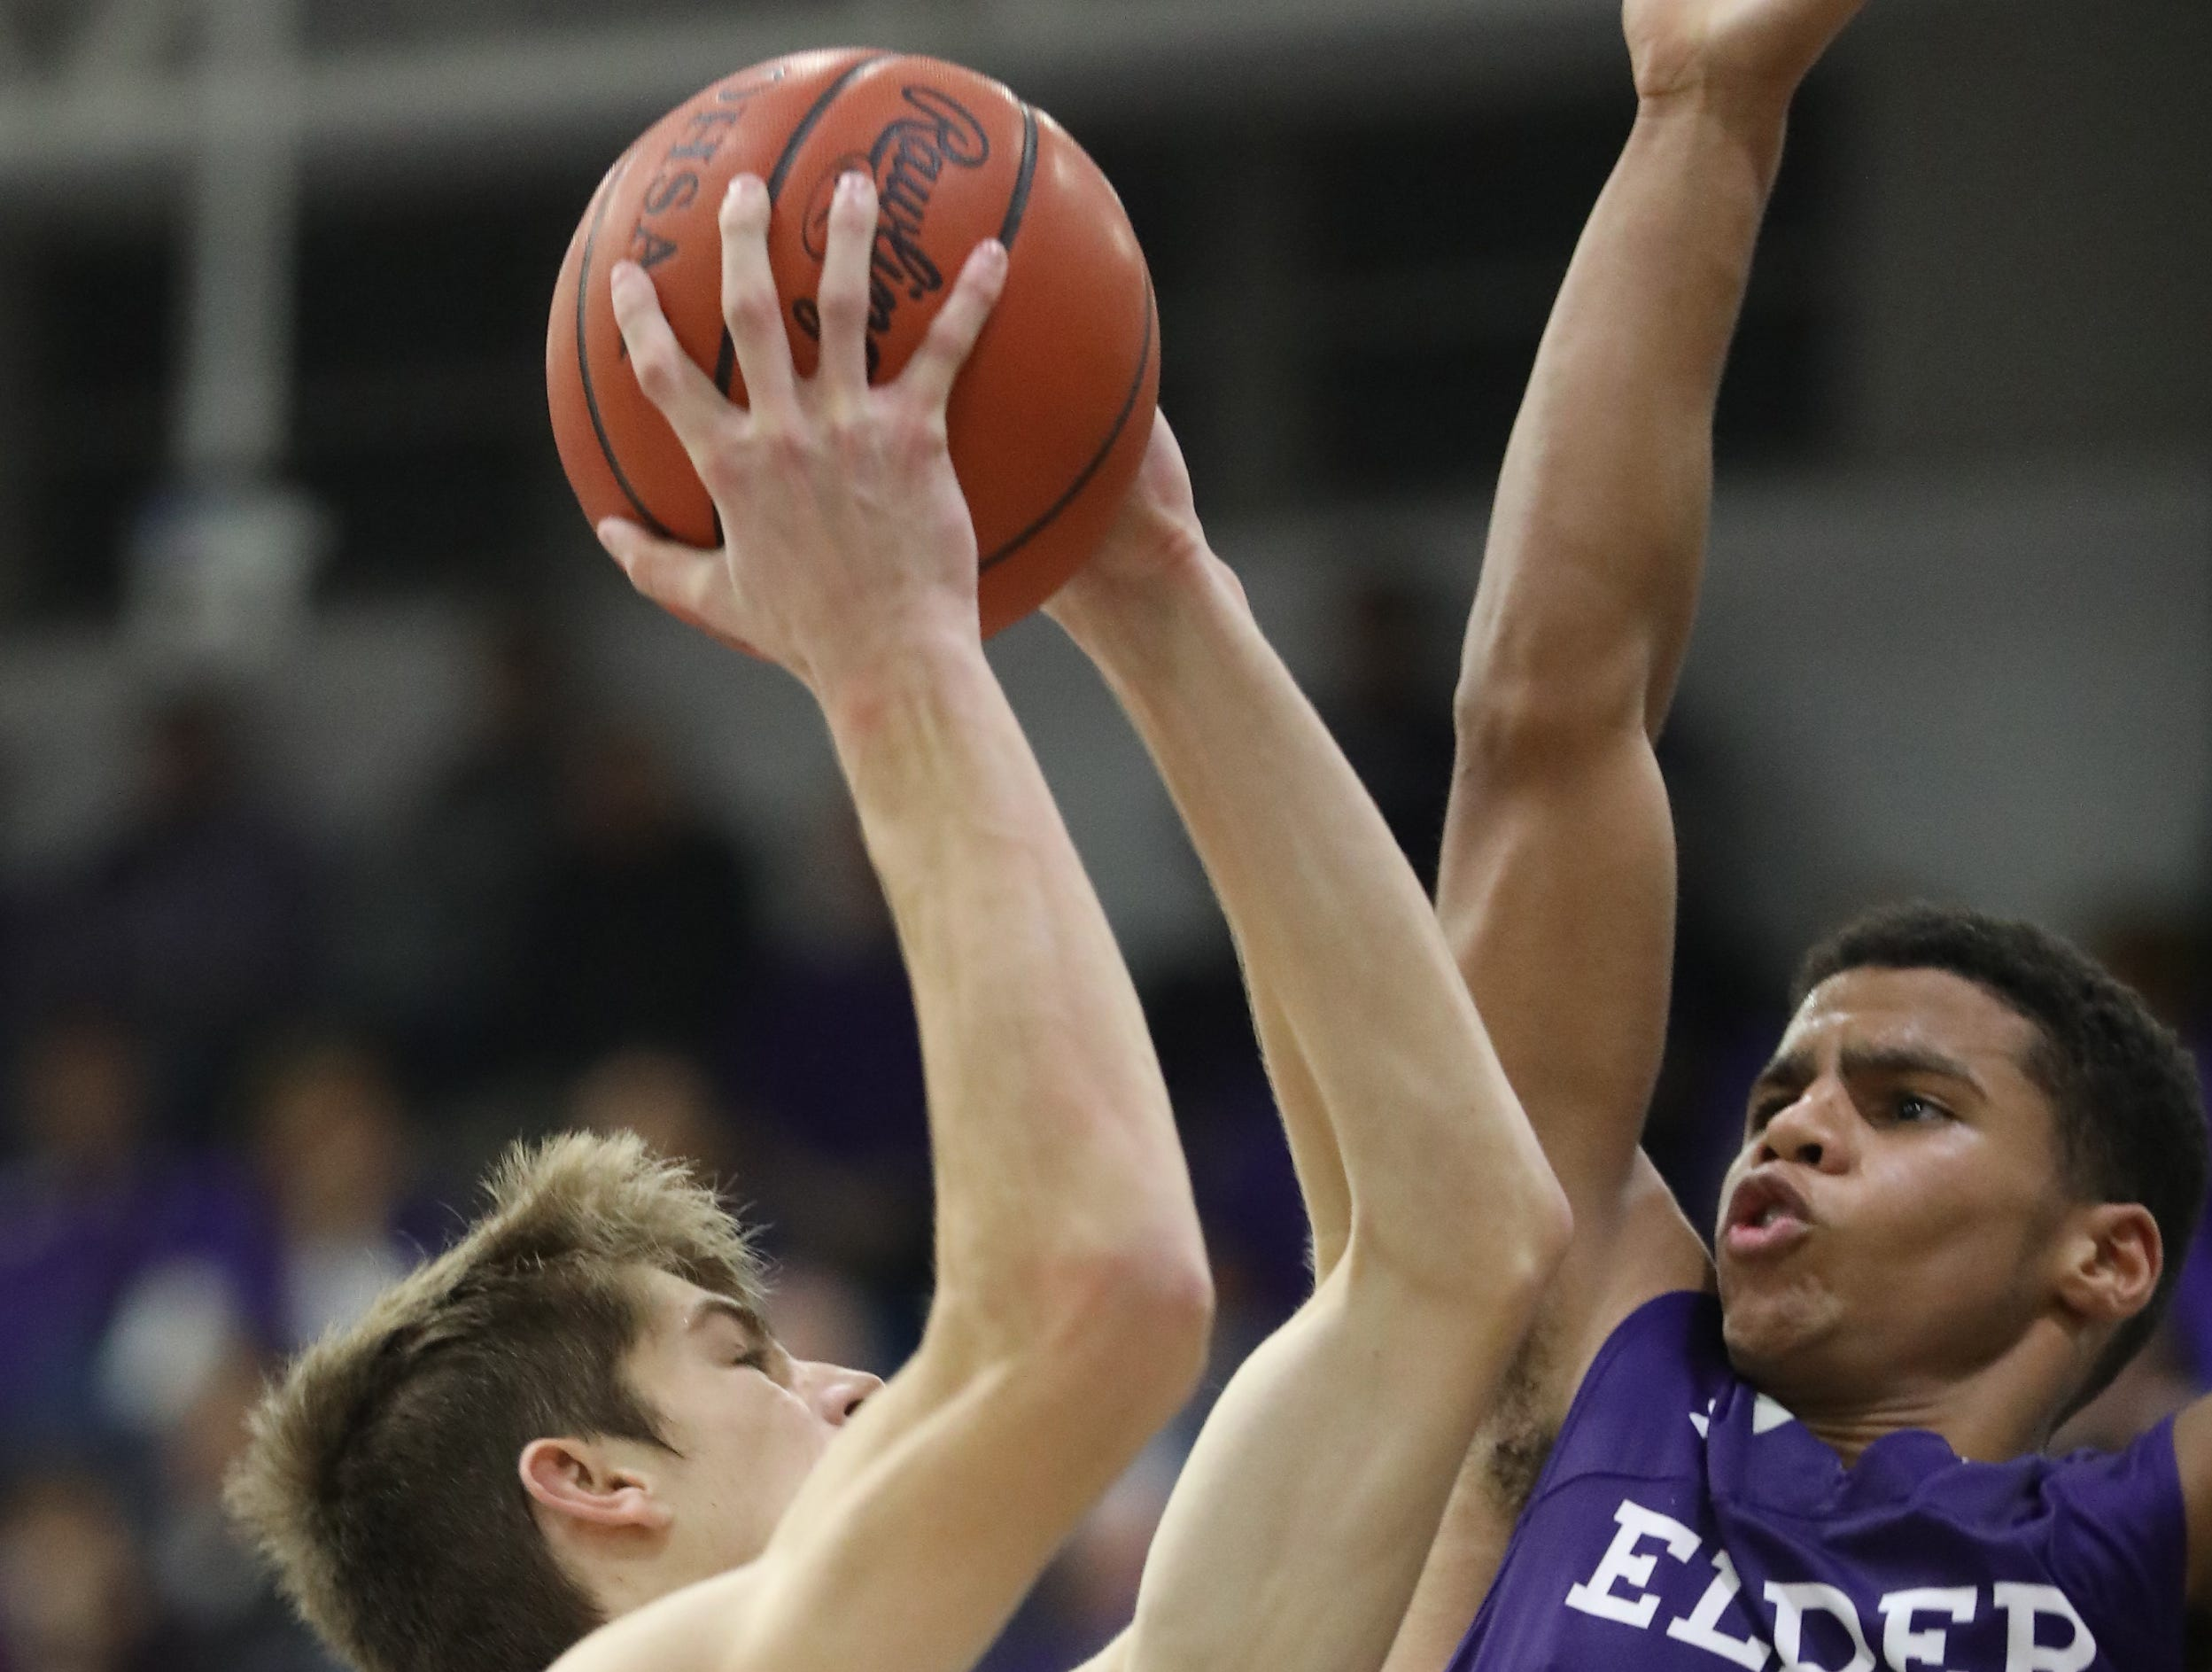 Elder guard Bryson Merz (23) tries to block a shot by St. Xavier forward Hank Thomas (20) during their basketball game Friday, Feb. 1, 2019.